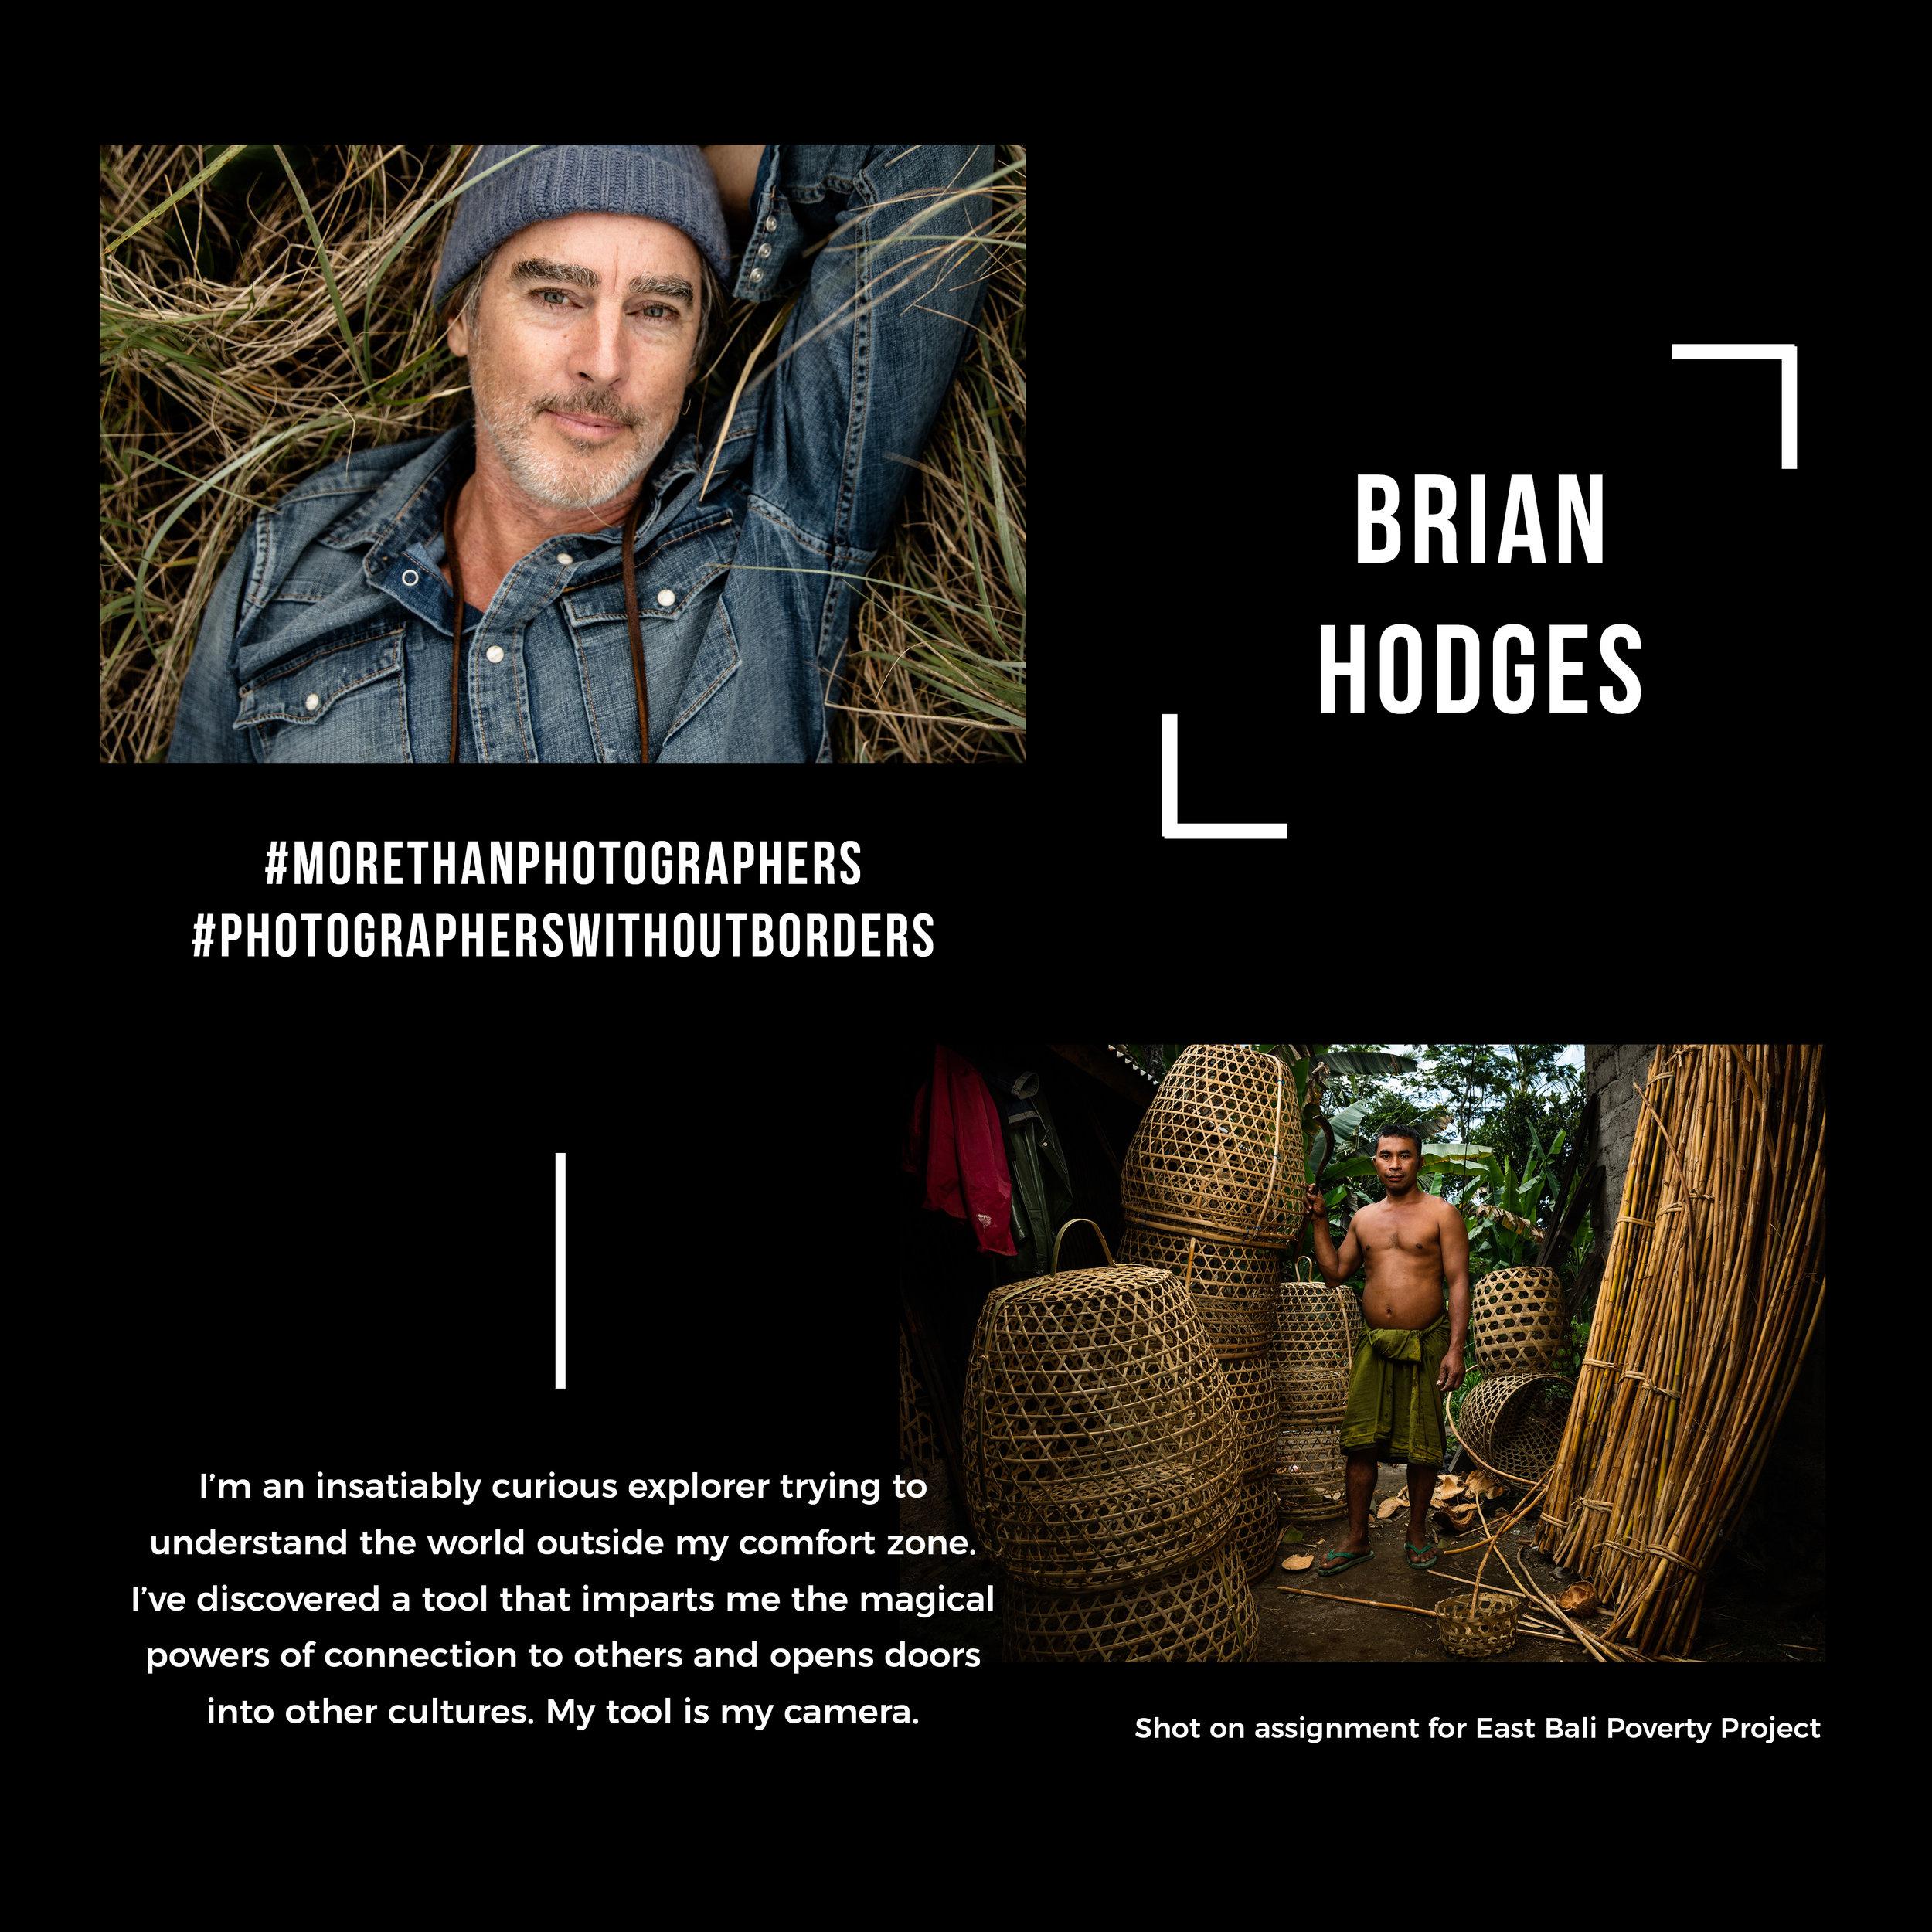 MTP_Brian Hodges_Graphics_Brian.jpg